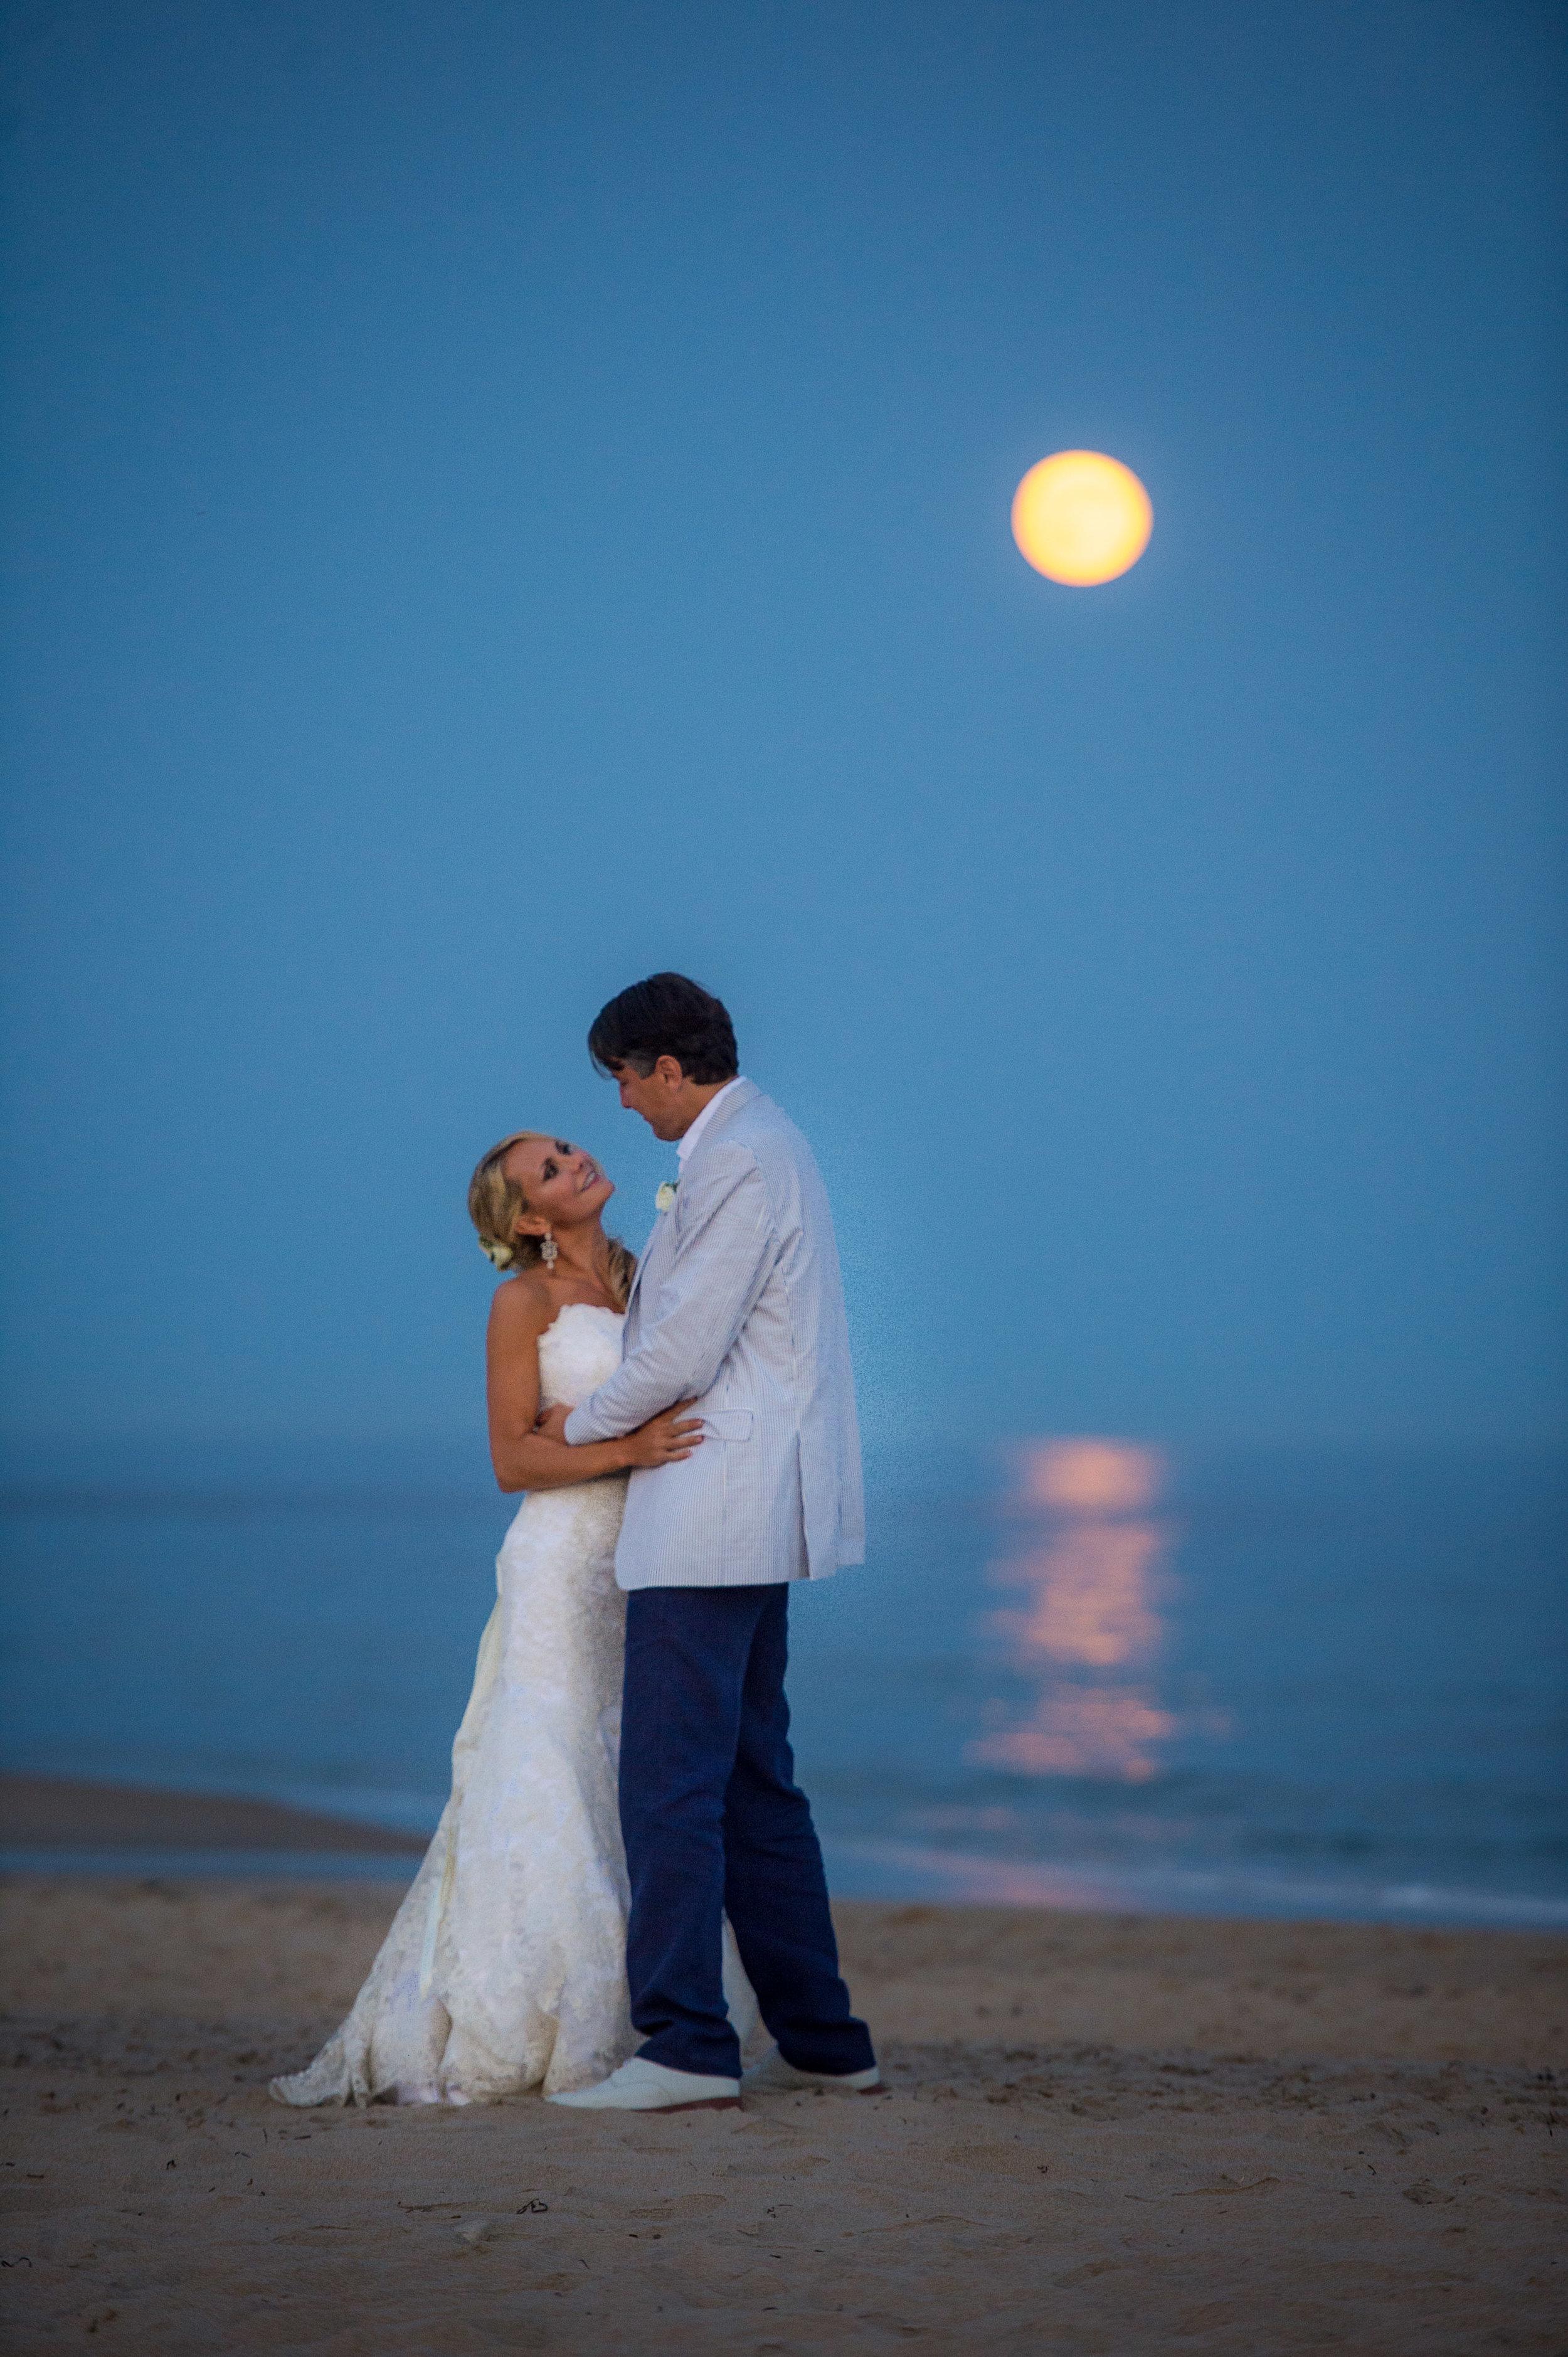 Craig Warga Weddings photography at the Ocean House RI